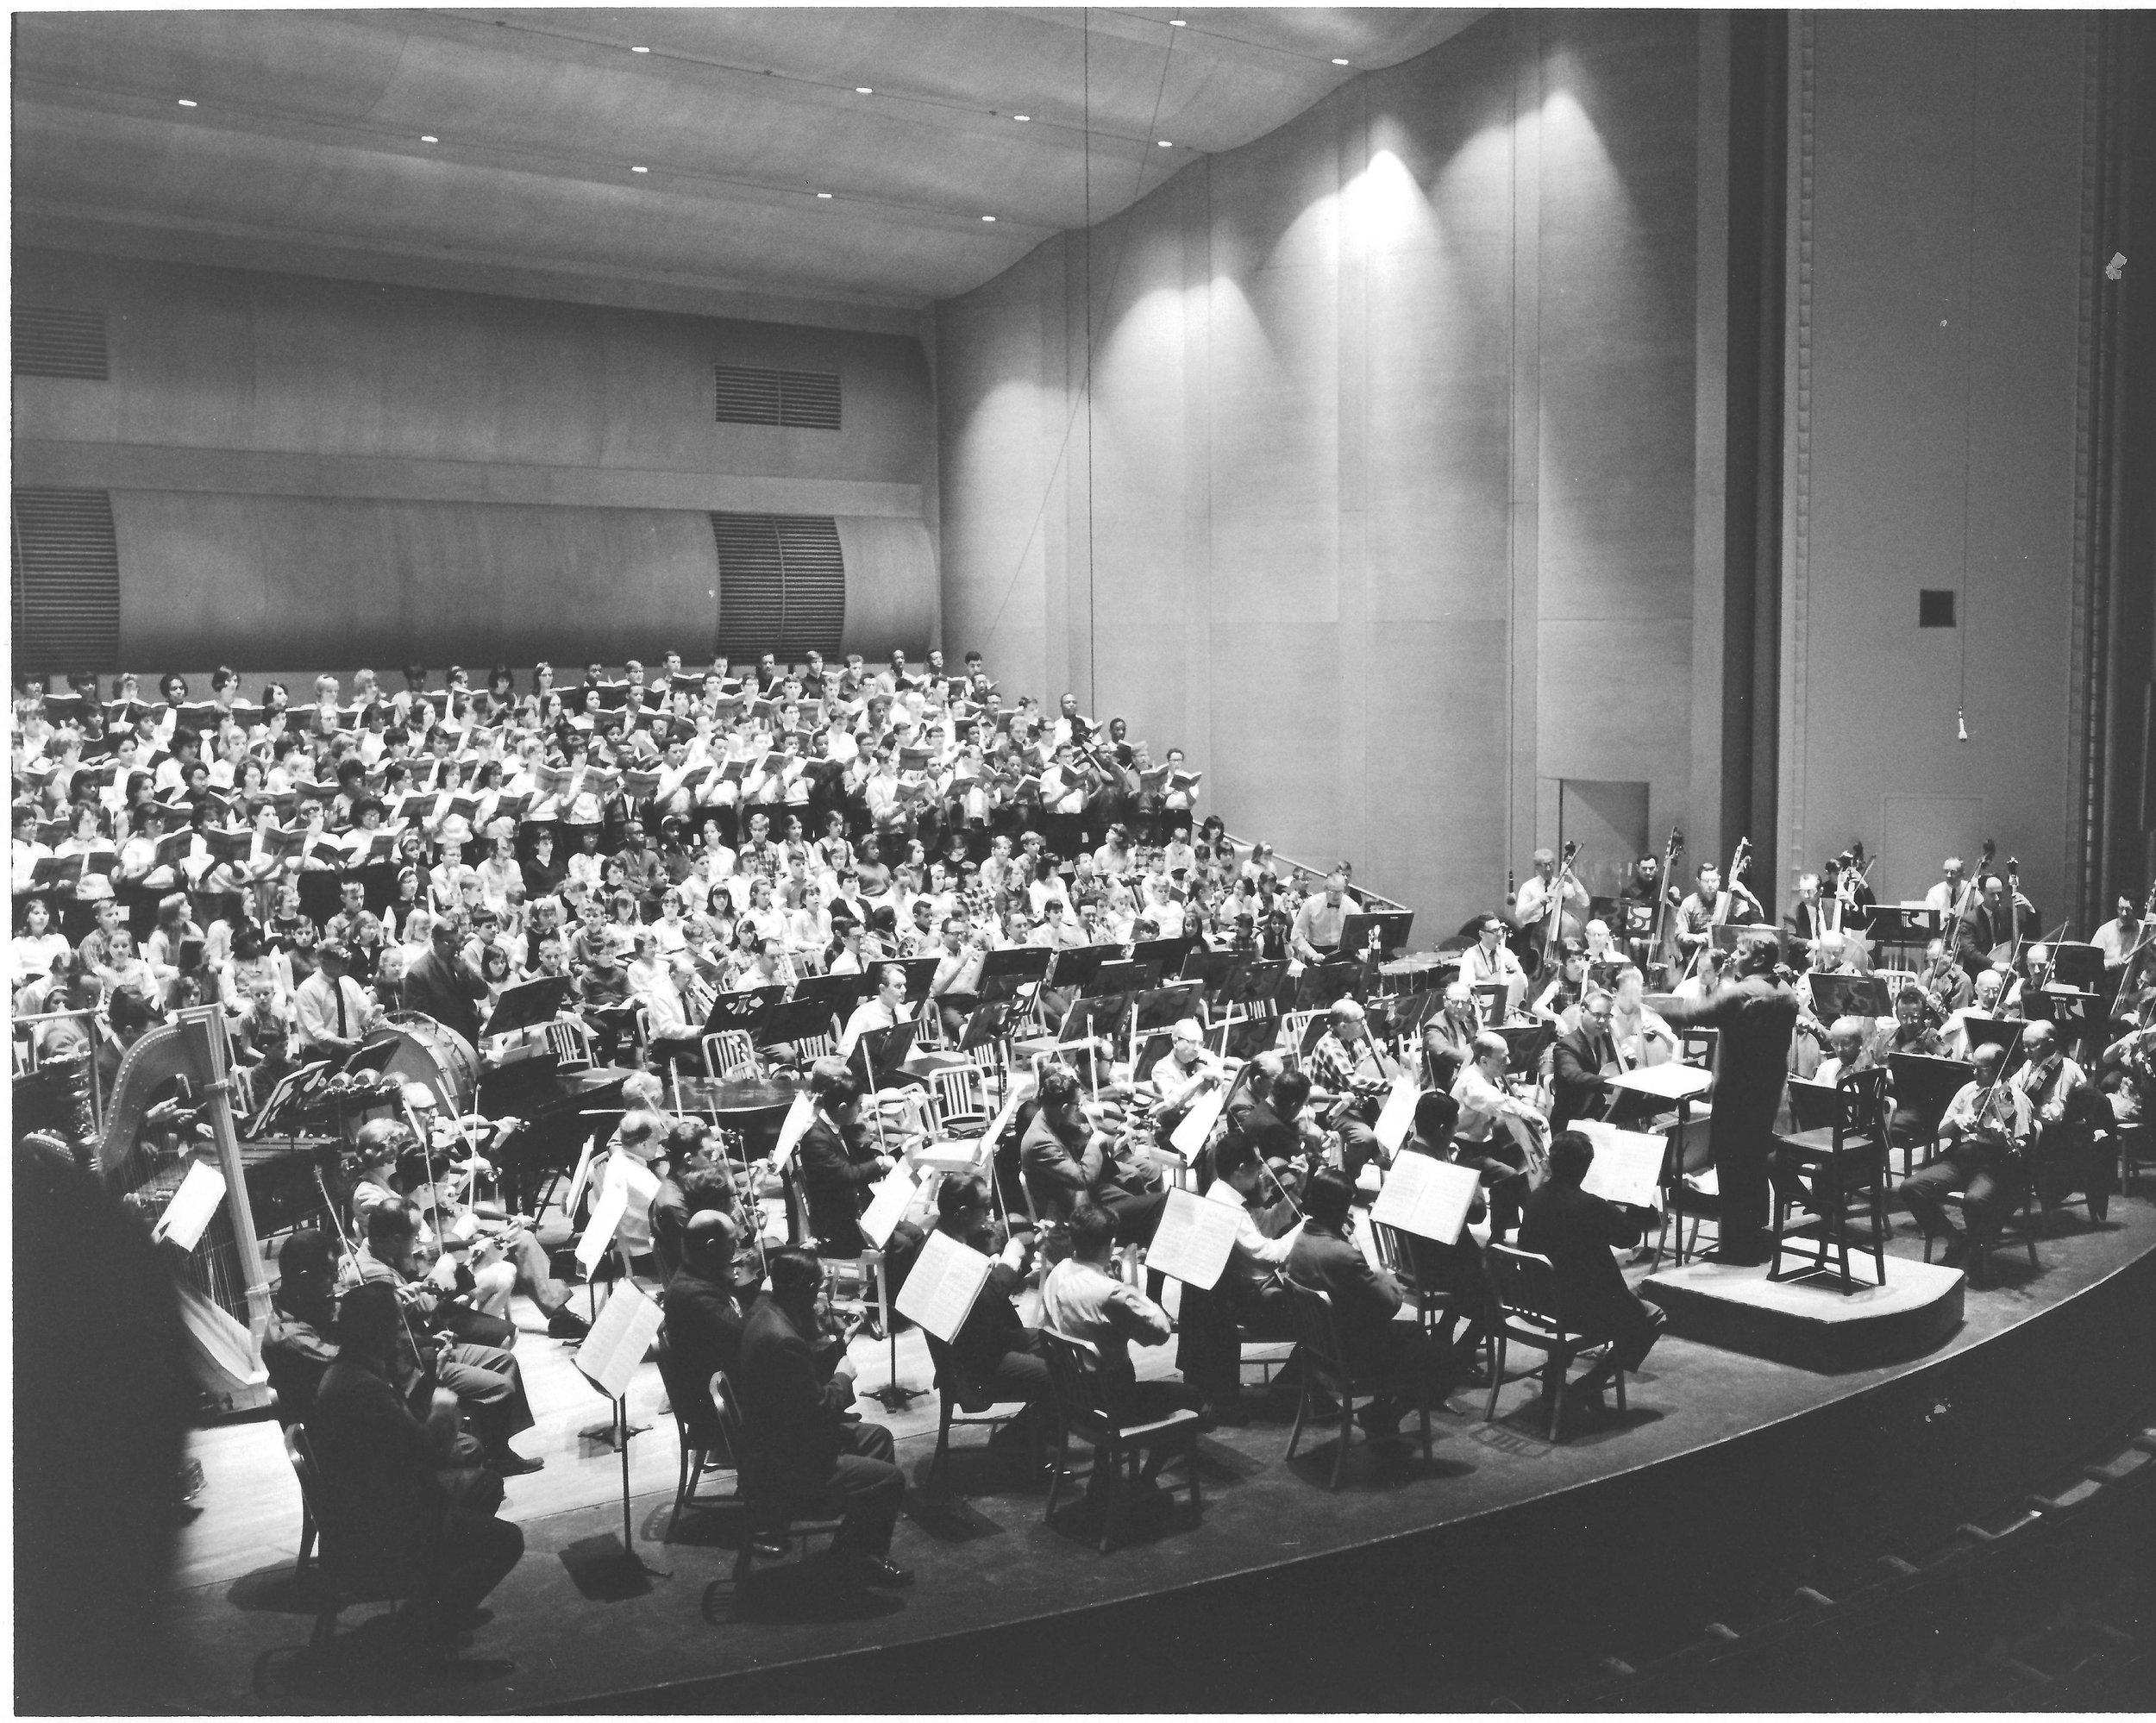 Robert Shaw Cleveland All-City Chorus Chichester Psalms March.jpg